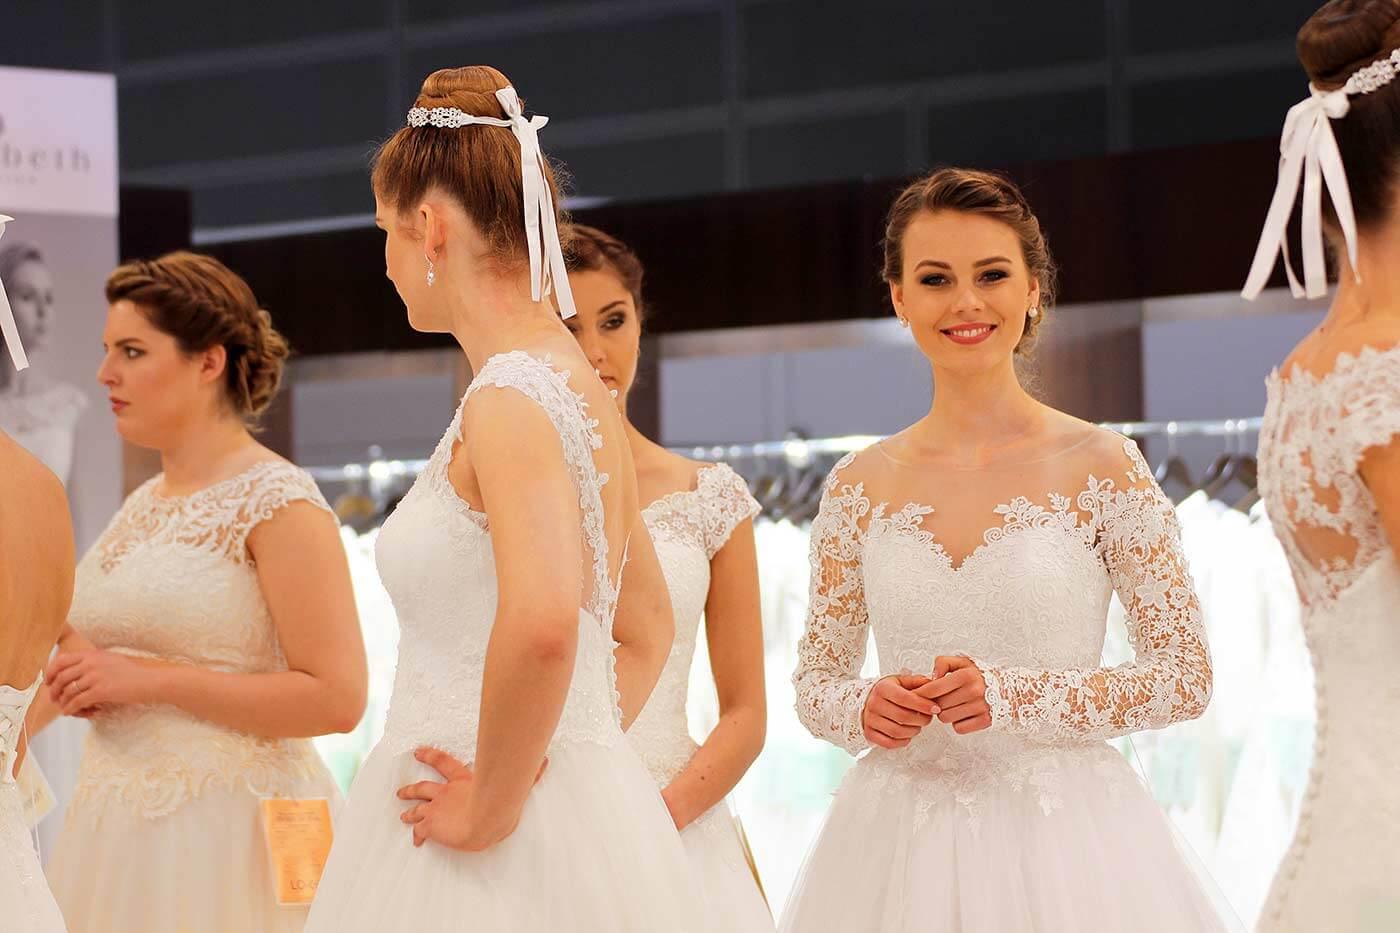 Brautkleider 2018 Trends - Spitze, Vintage & Boho